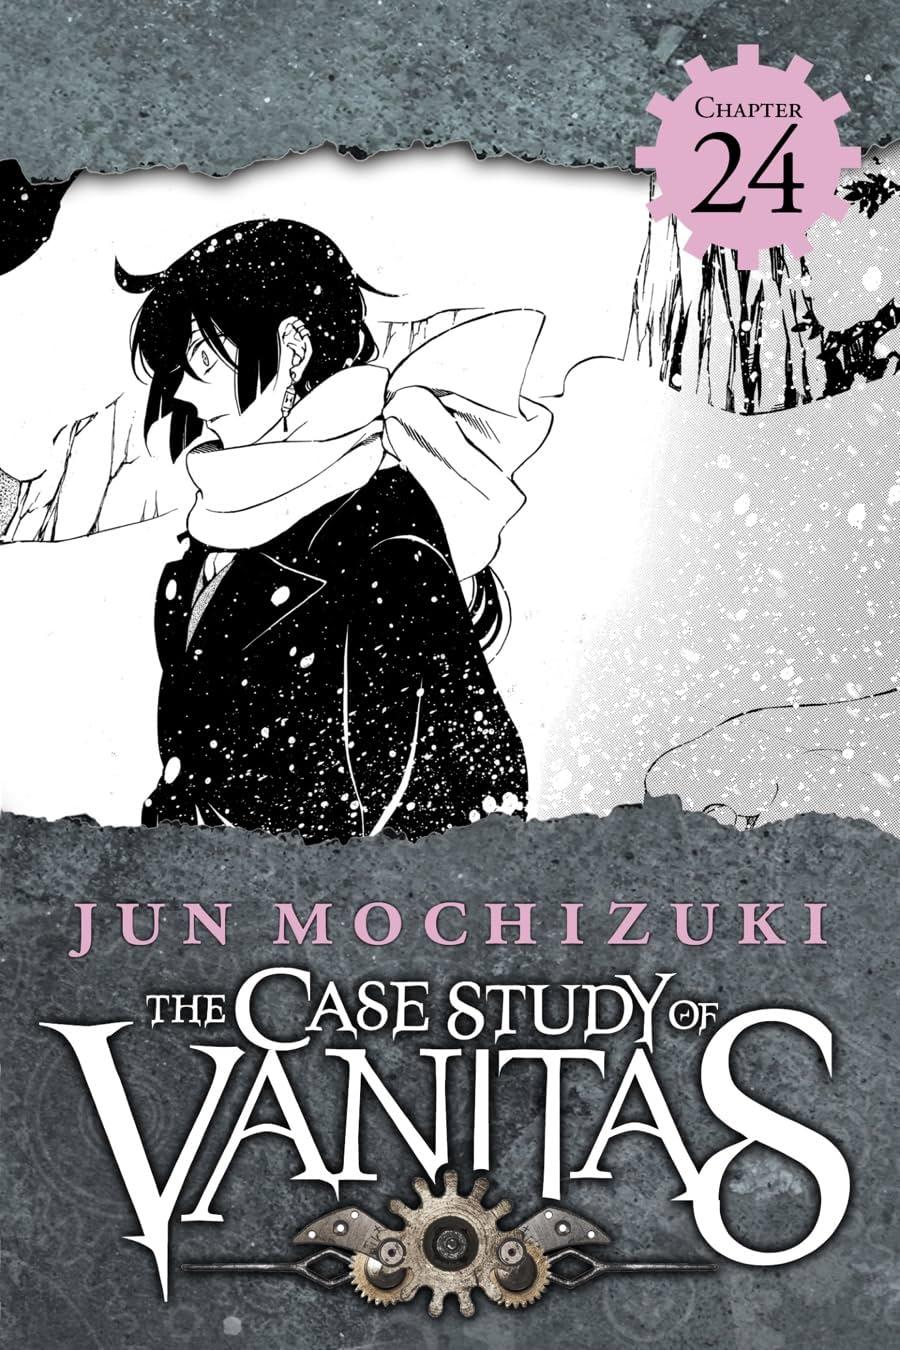 The Case Study of Vanitas #24